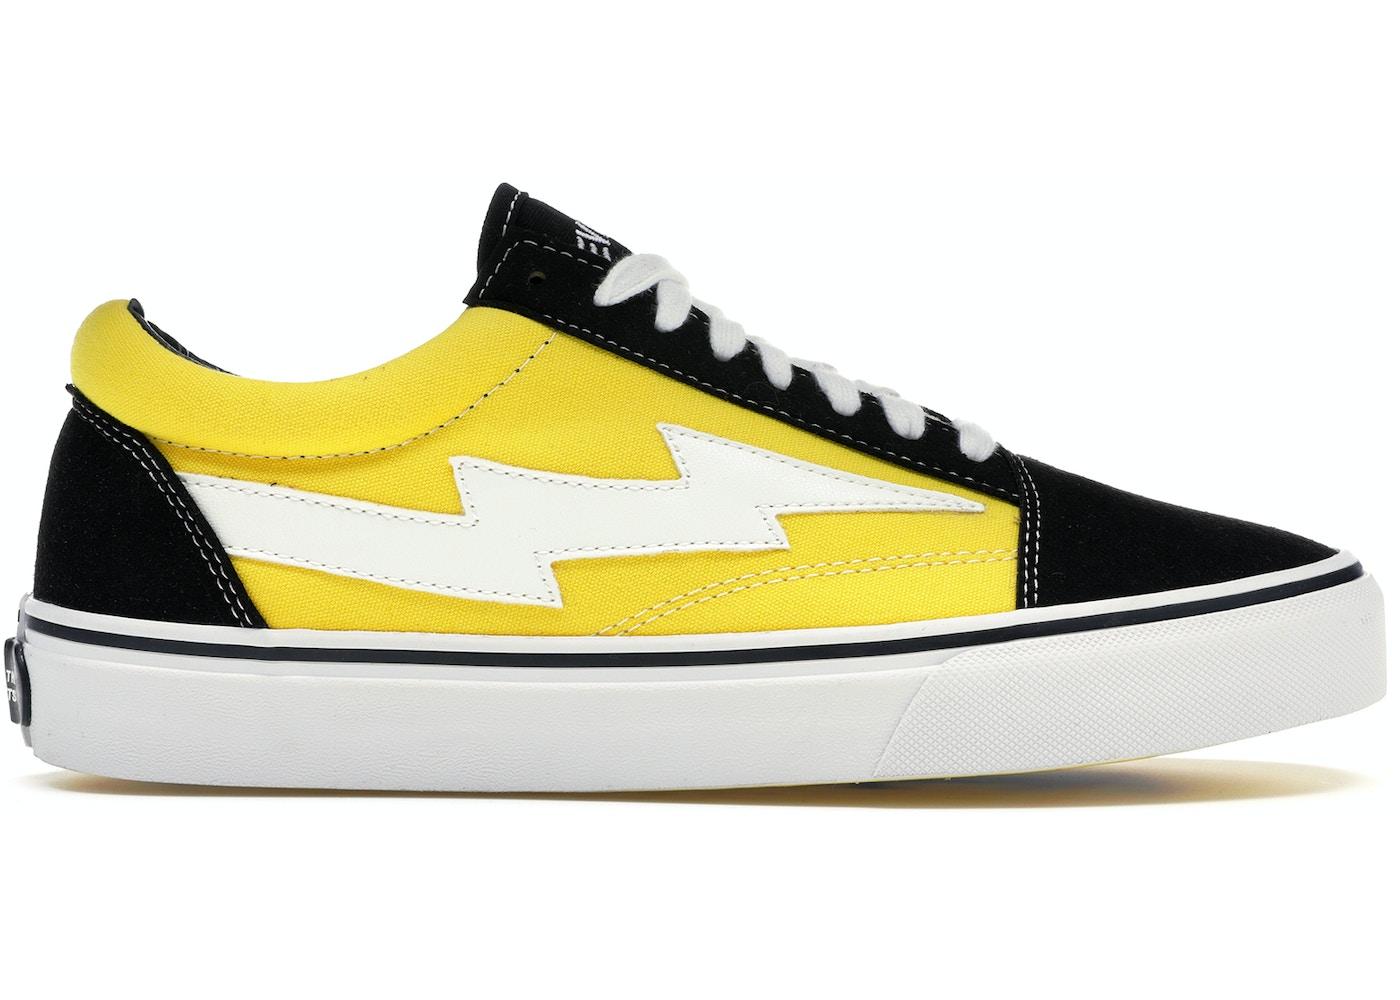 18340639044b39 Revenge X Storm Low Top Black Yellow - RS588977-004